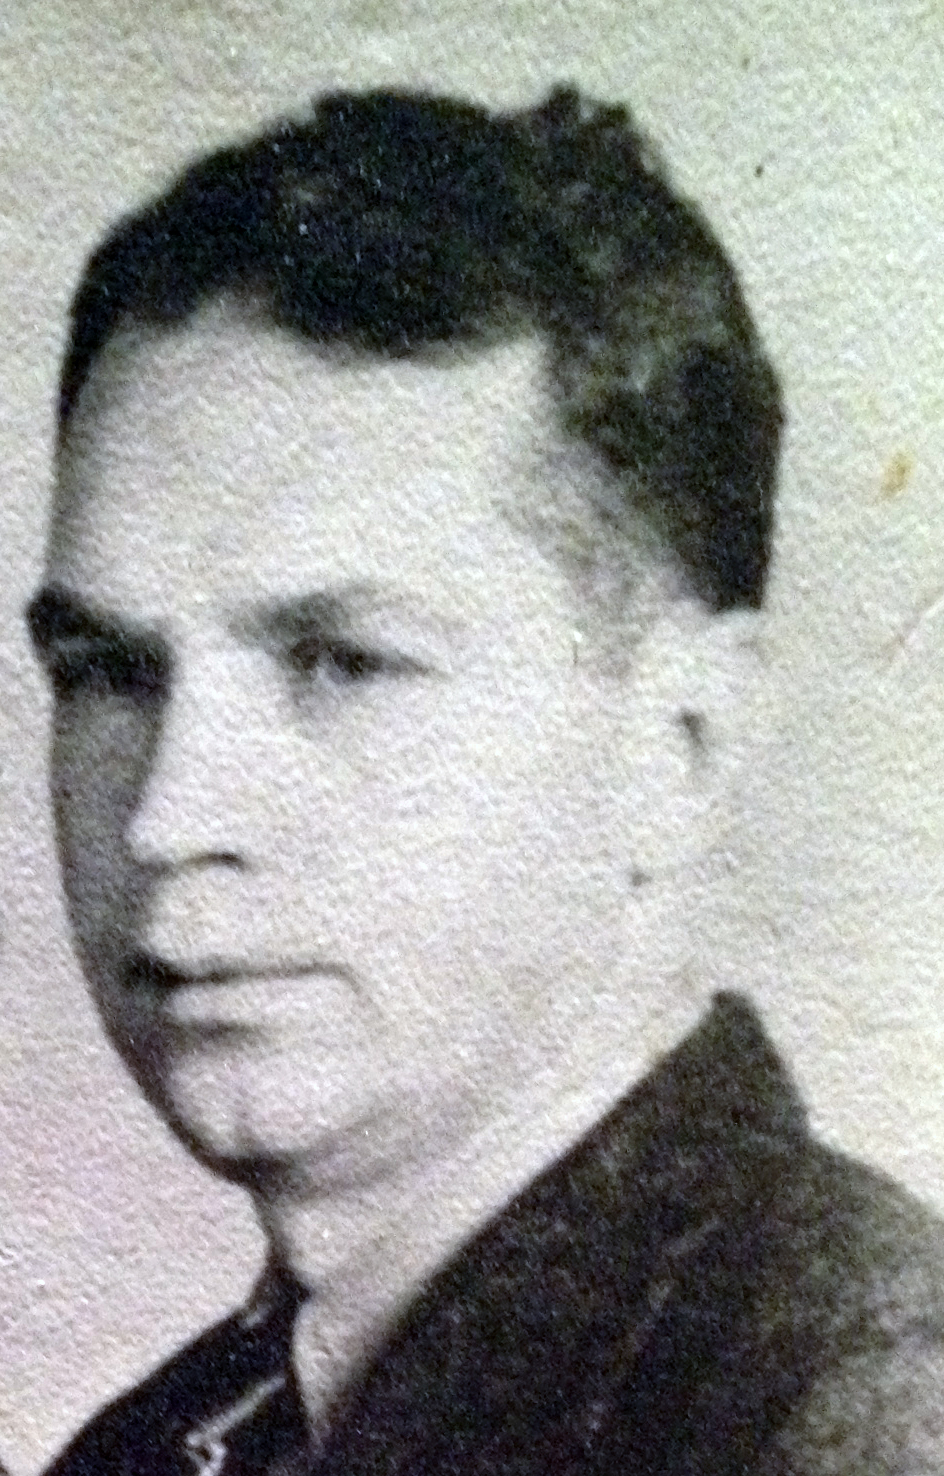 Night Chief James J. Paulk   West Frankfort Police Department, Illinois